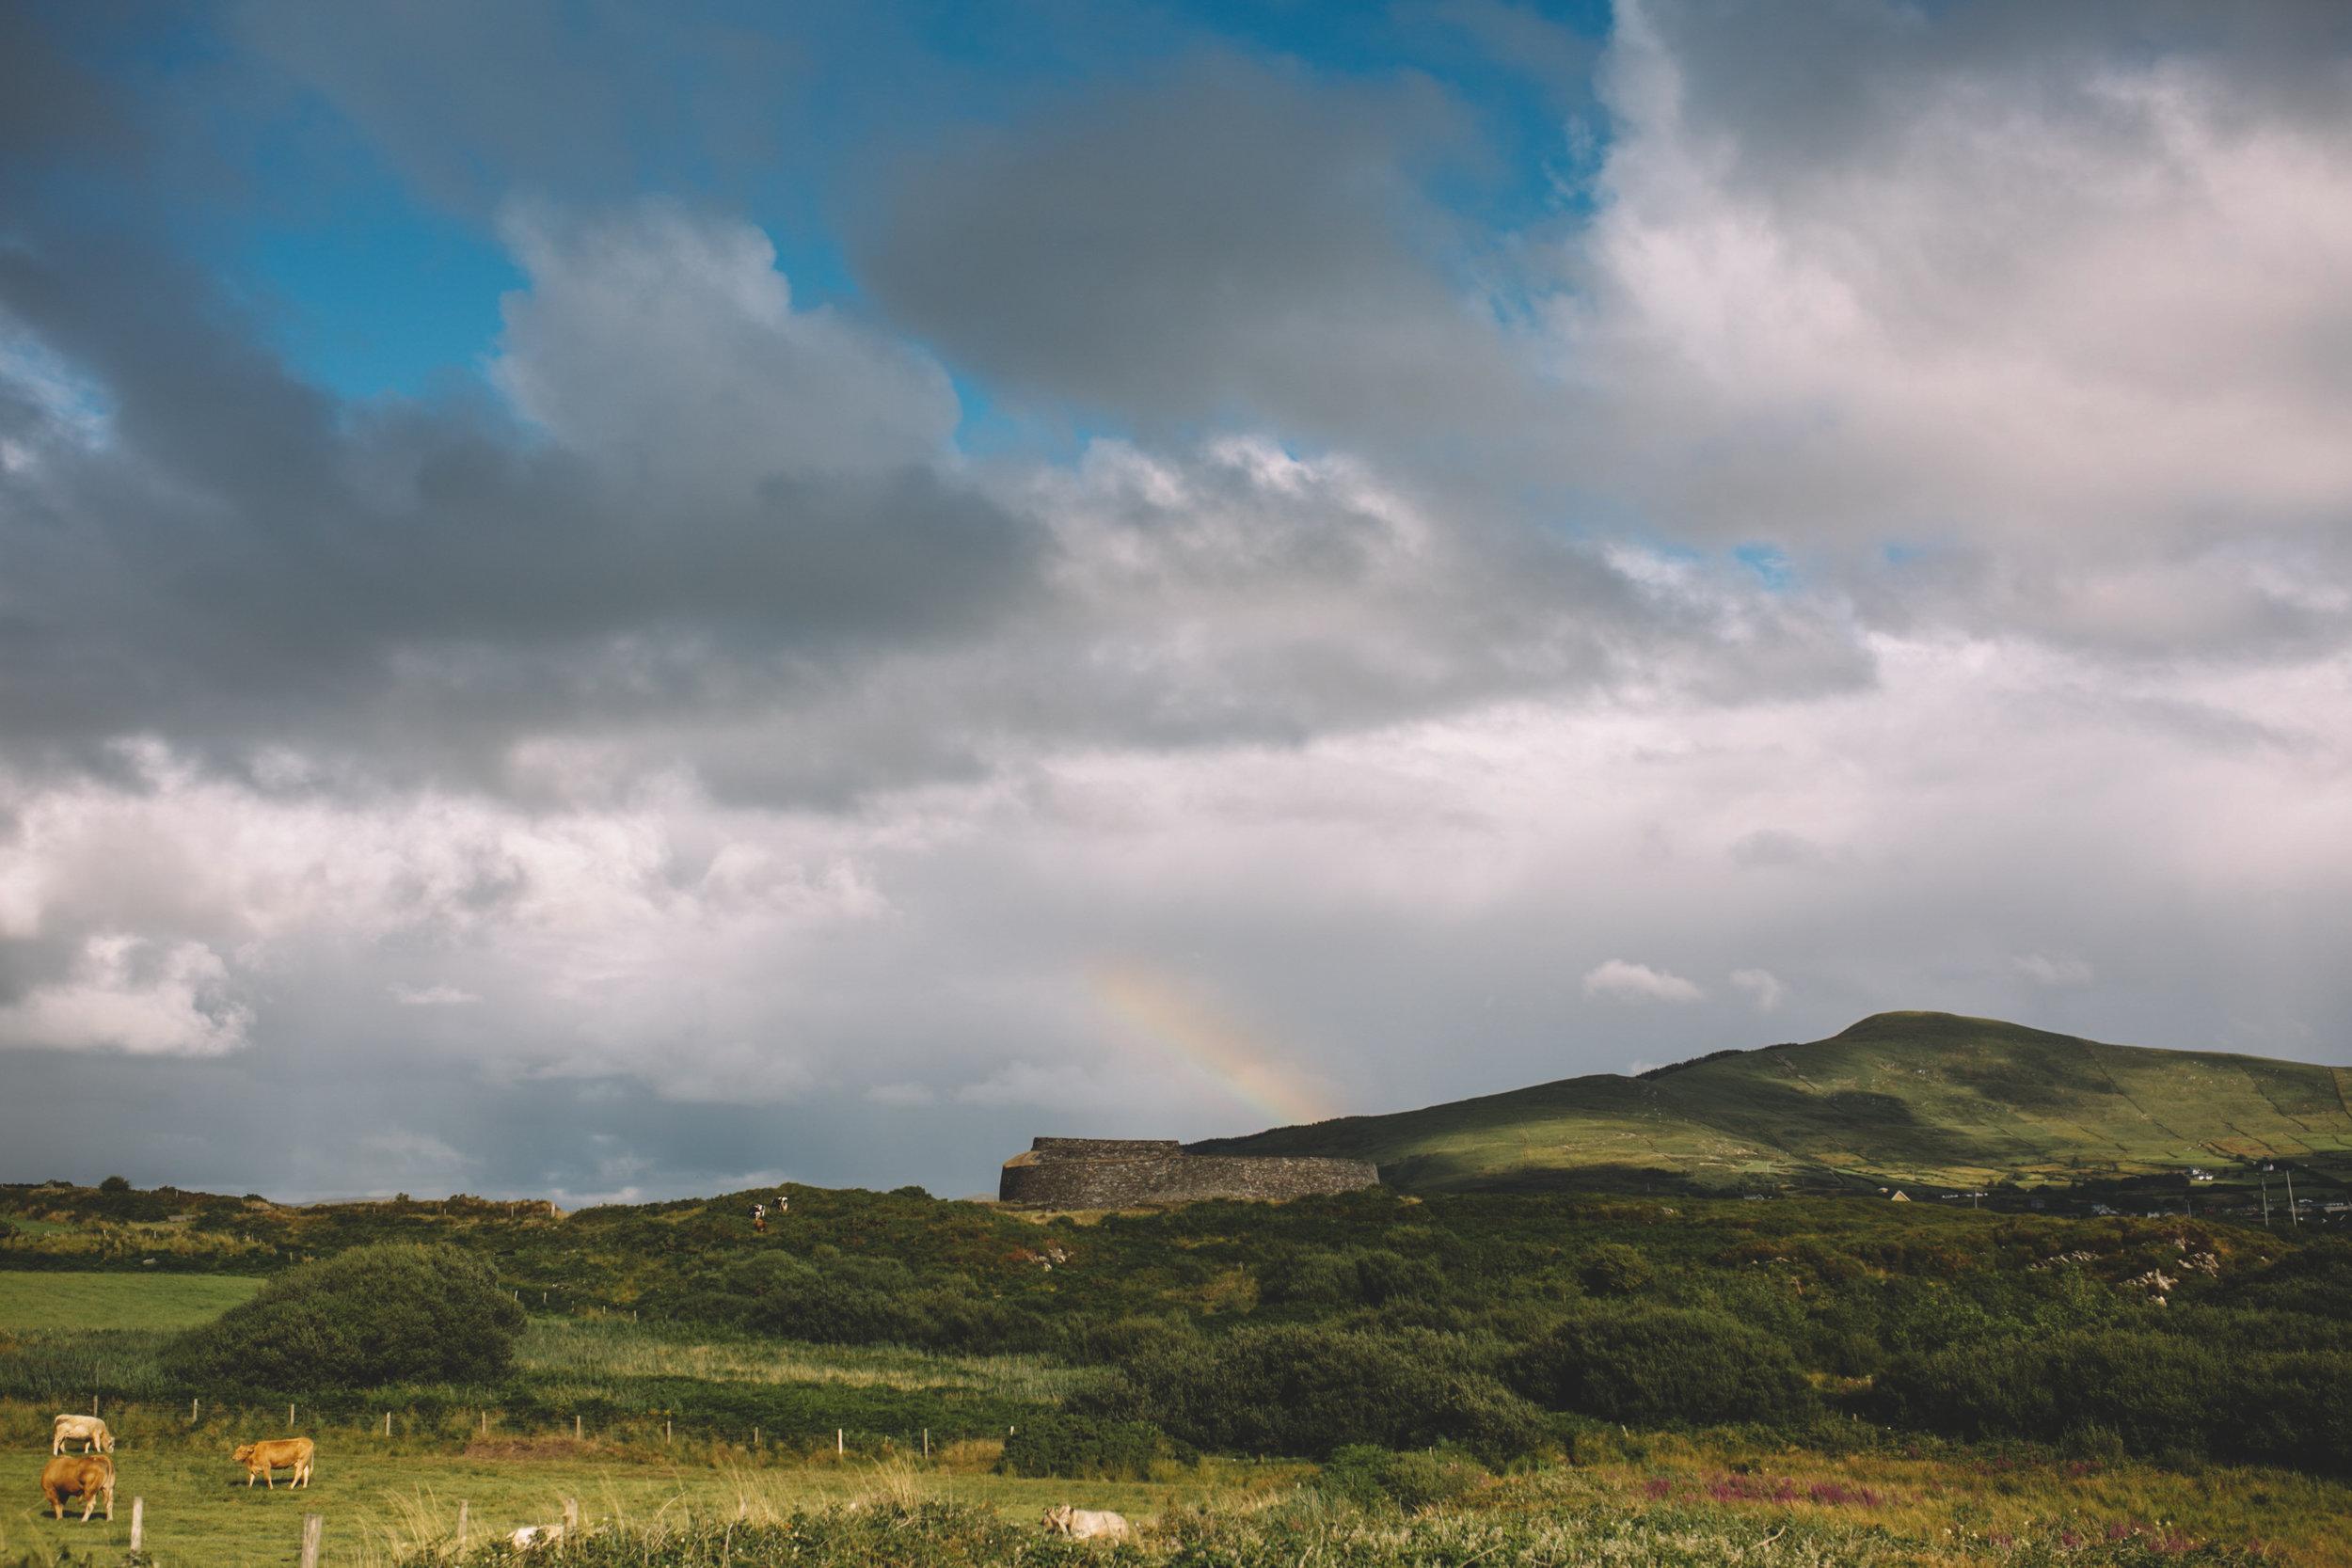 10 Tear Anniversary Trip - Ballinskelligs Ireland + Castle  (82 of 197).jpg